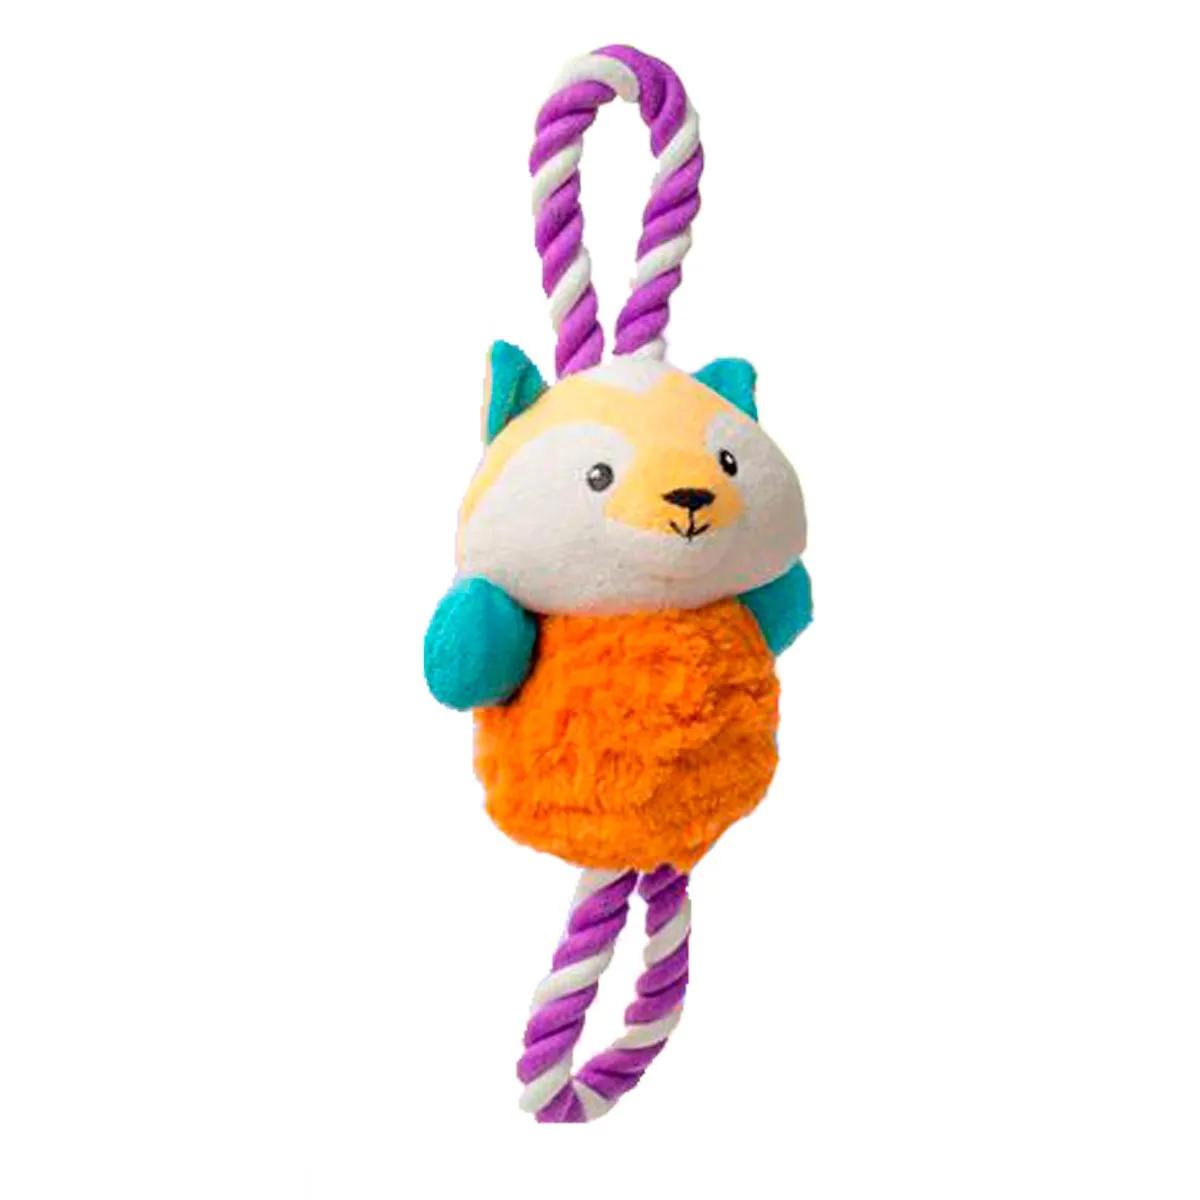 Brinquedo de Pelúcia para Cachorro Cabo de Guerra Raposa Infinity Adoleta